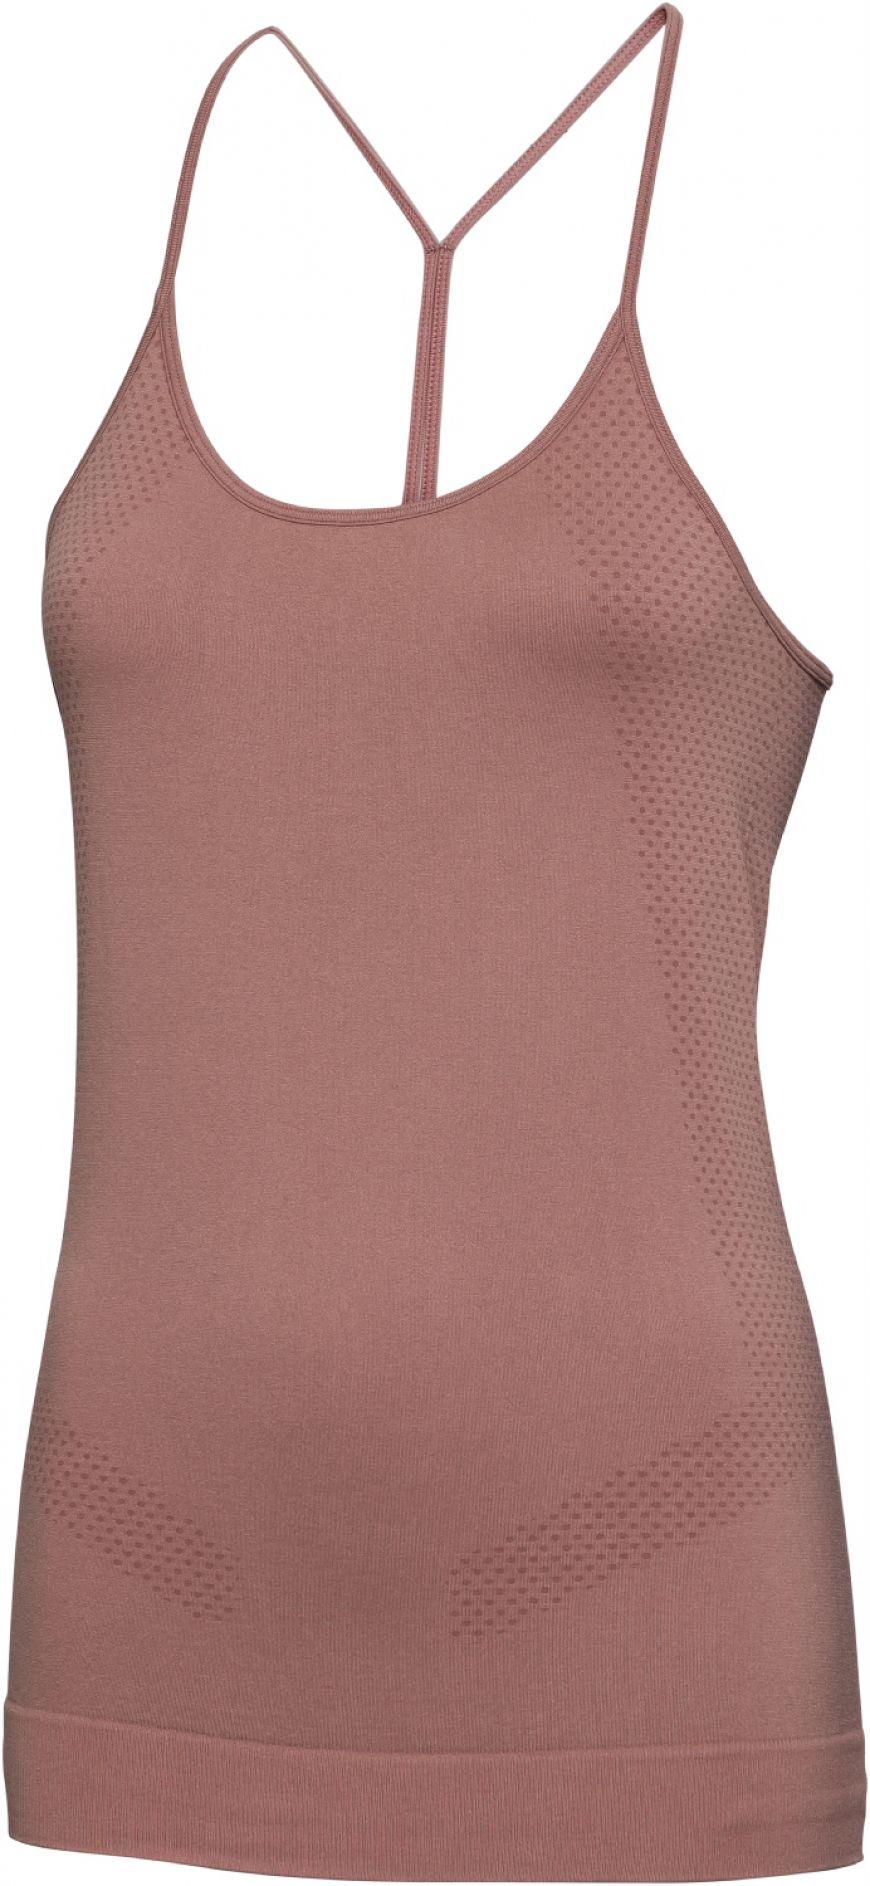 Yoga Vest 4 99